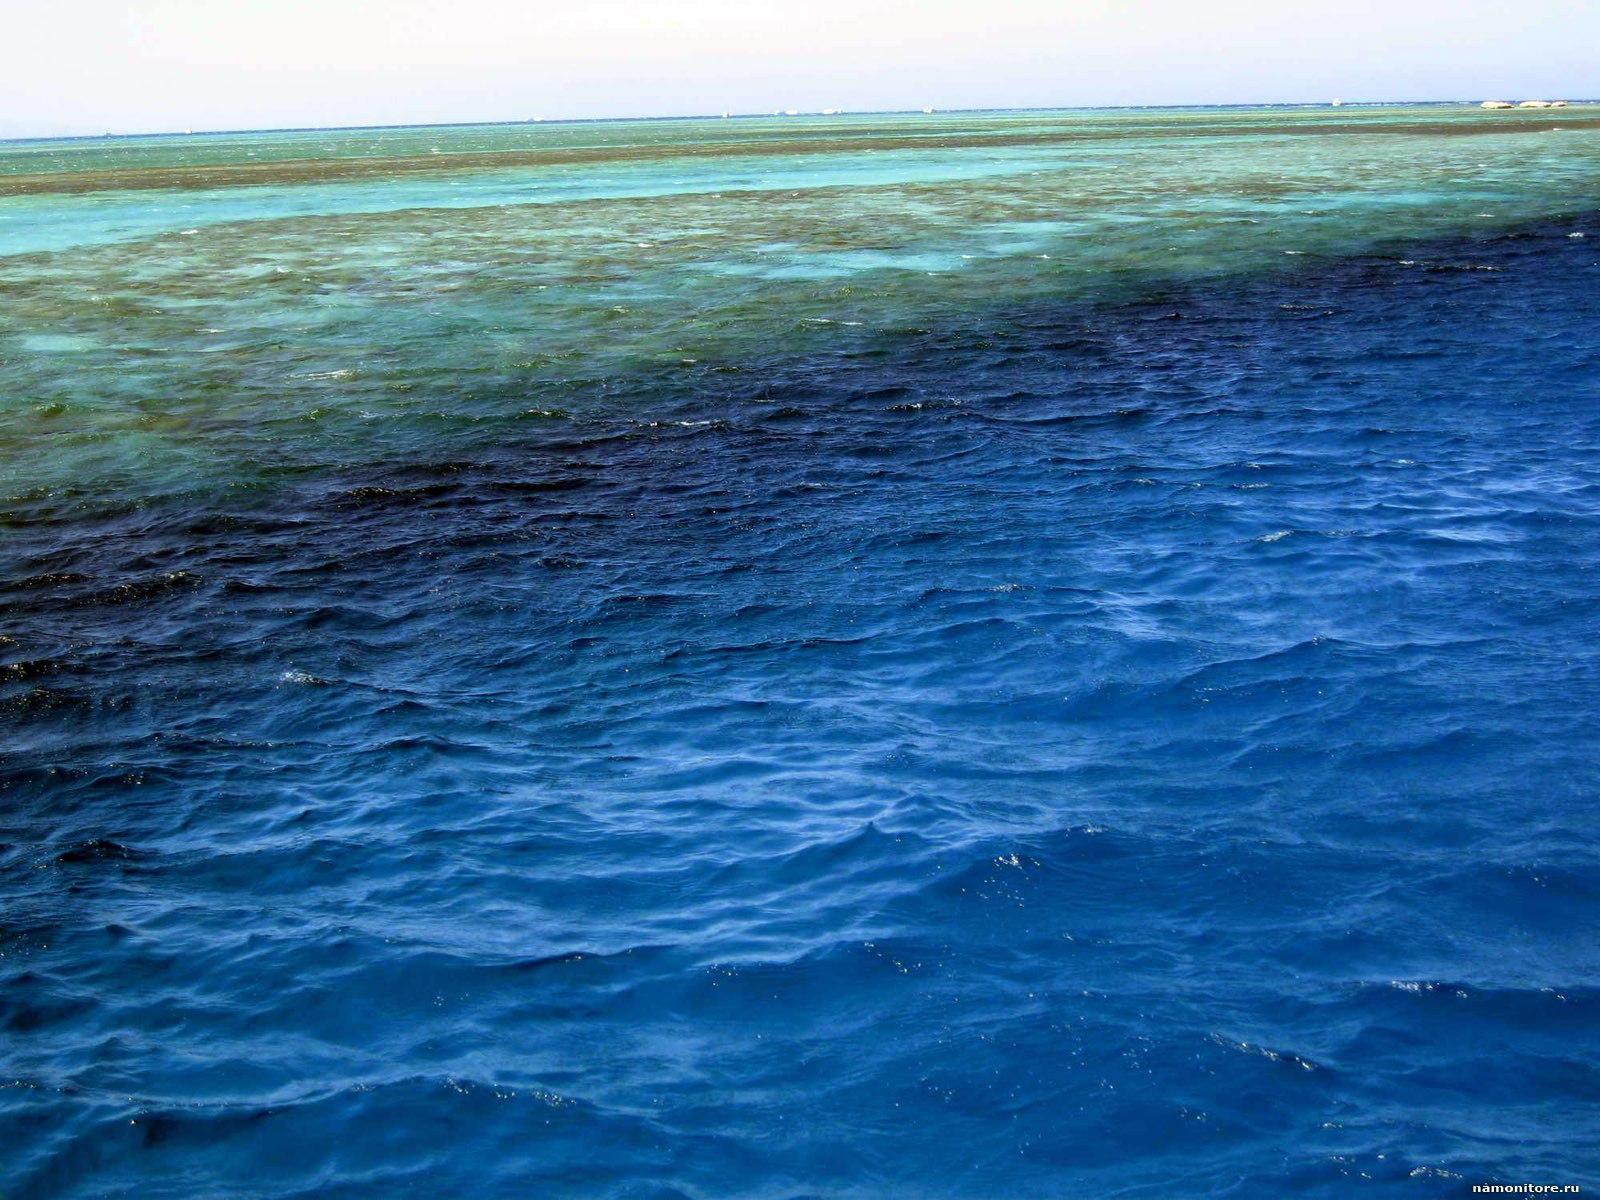 Неизвестное вещество попало в море с винзавода